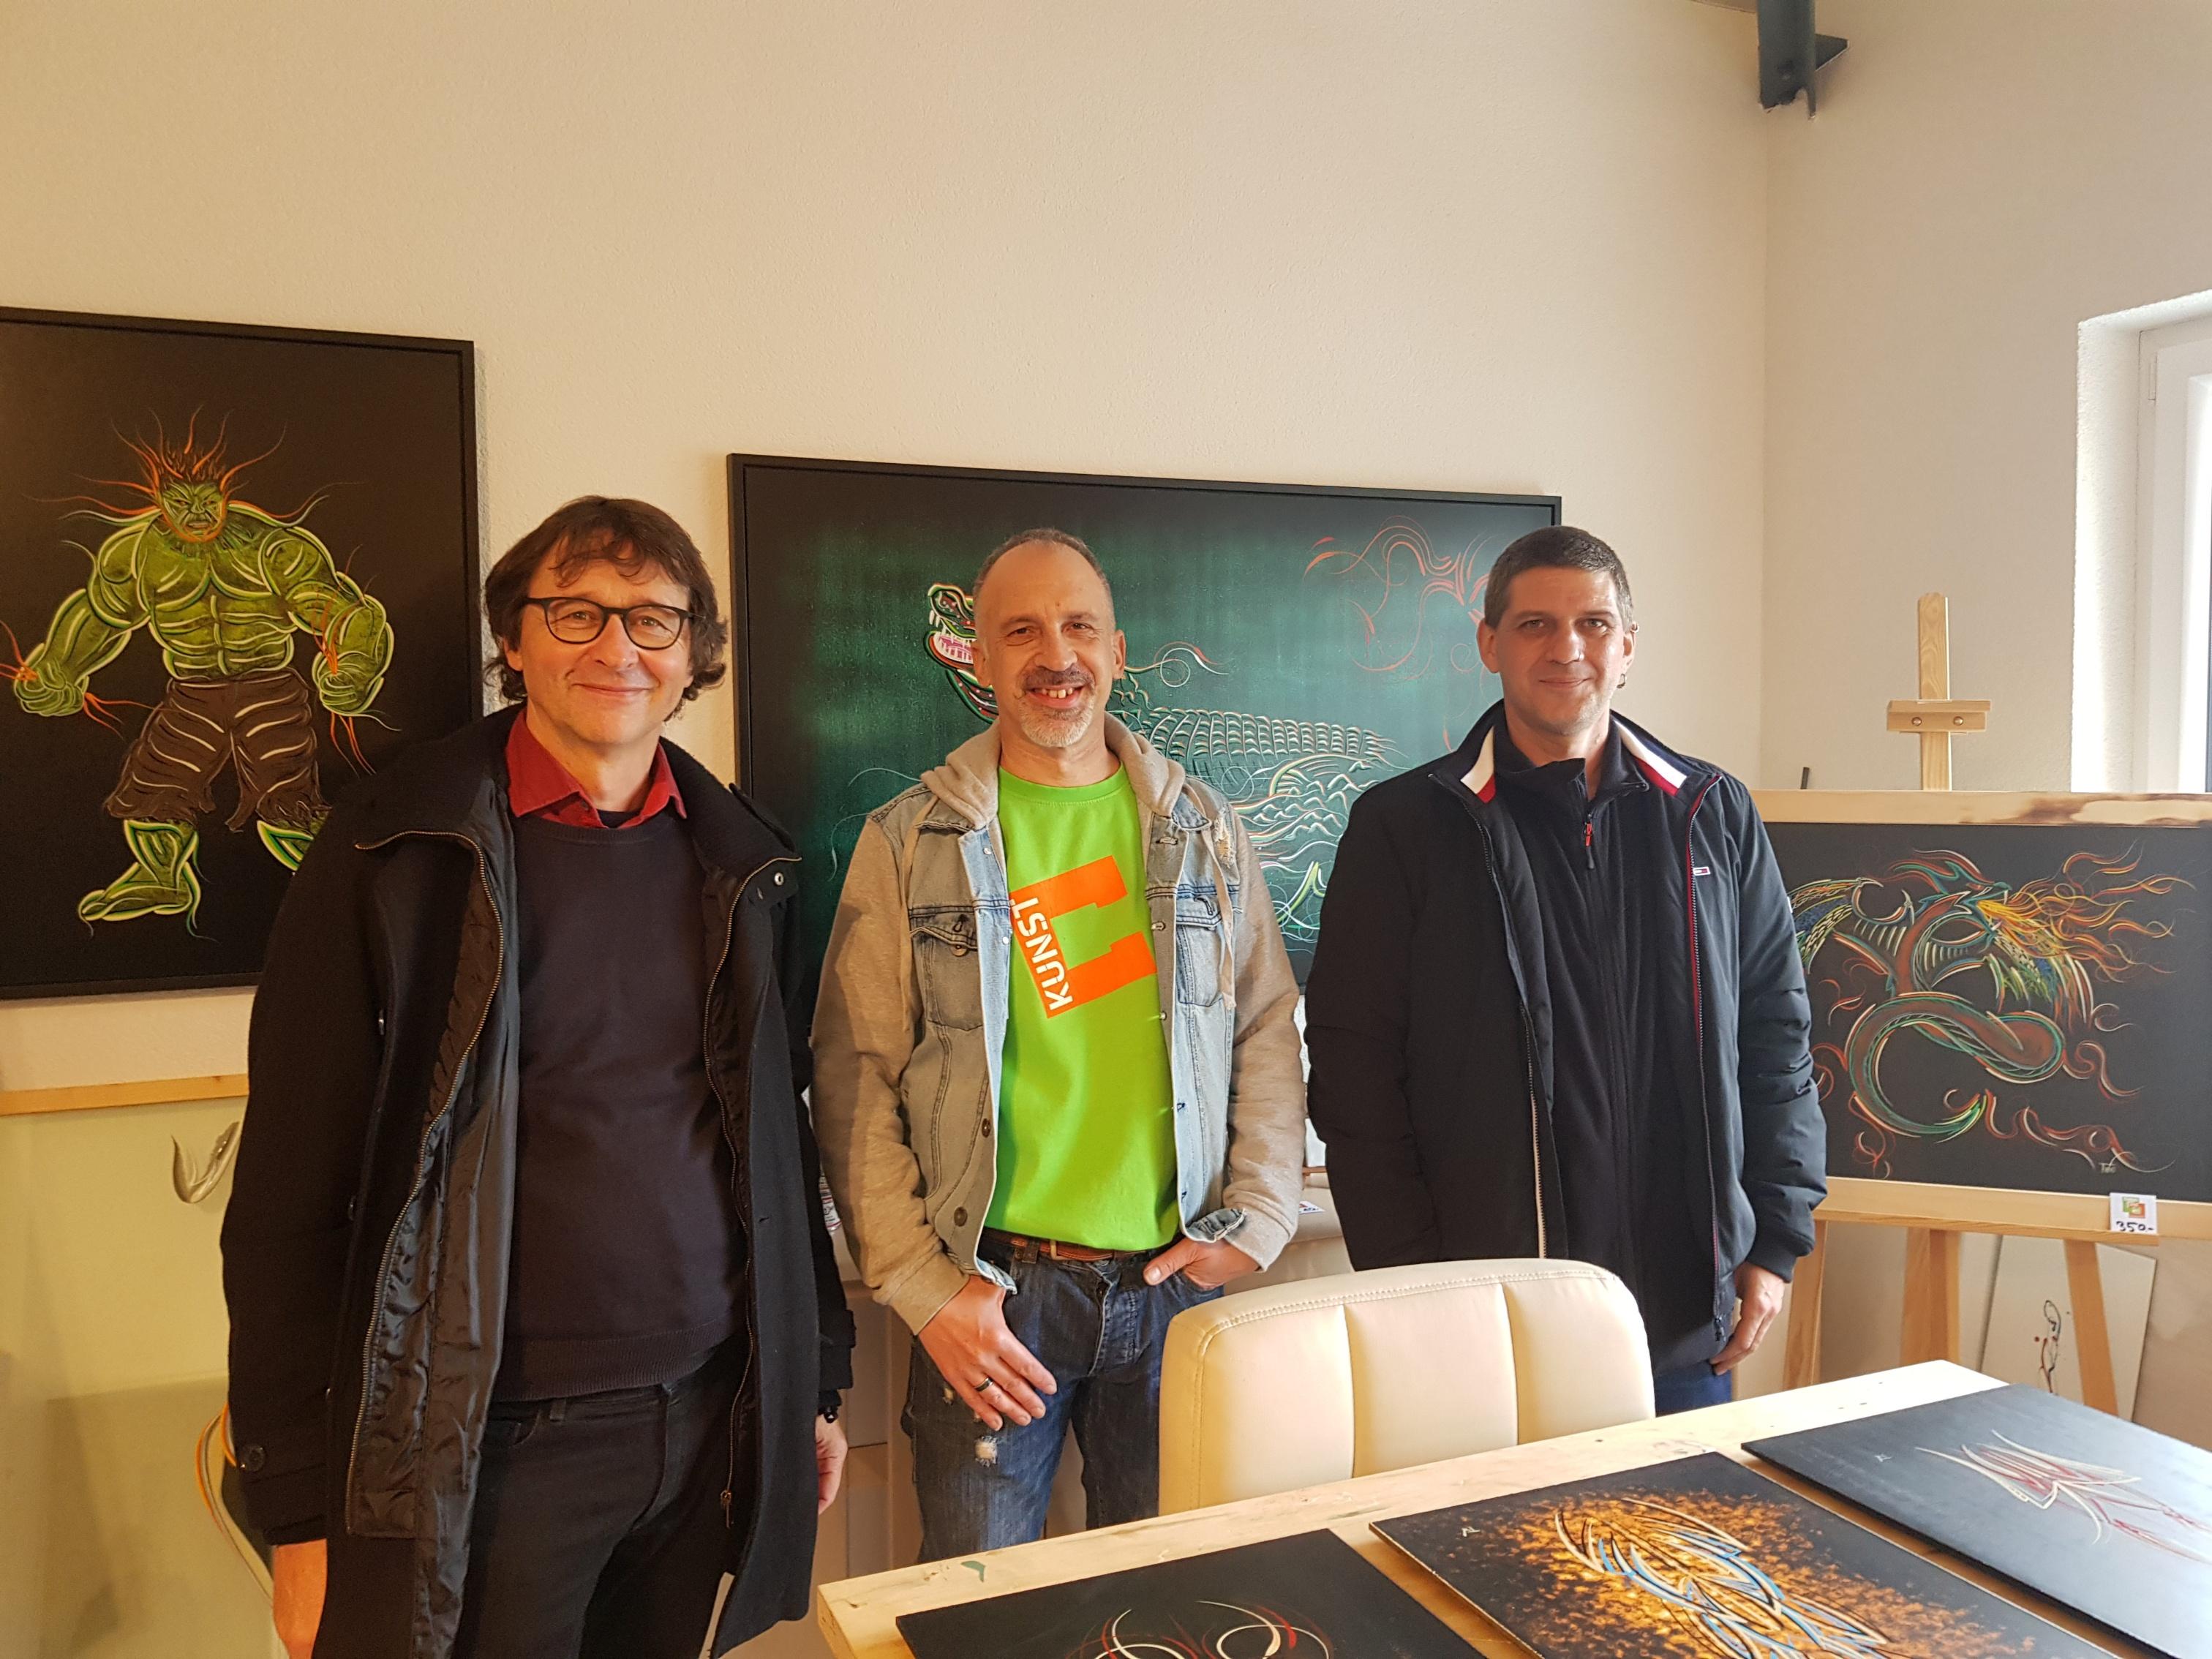 Benno, Thomas & Christoph